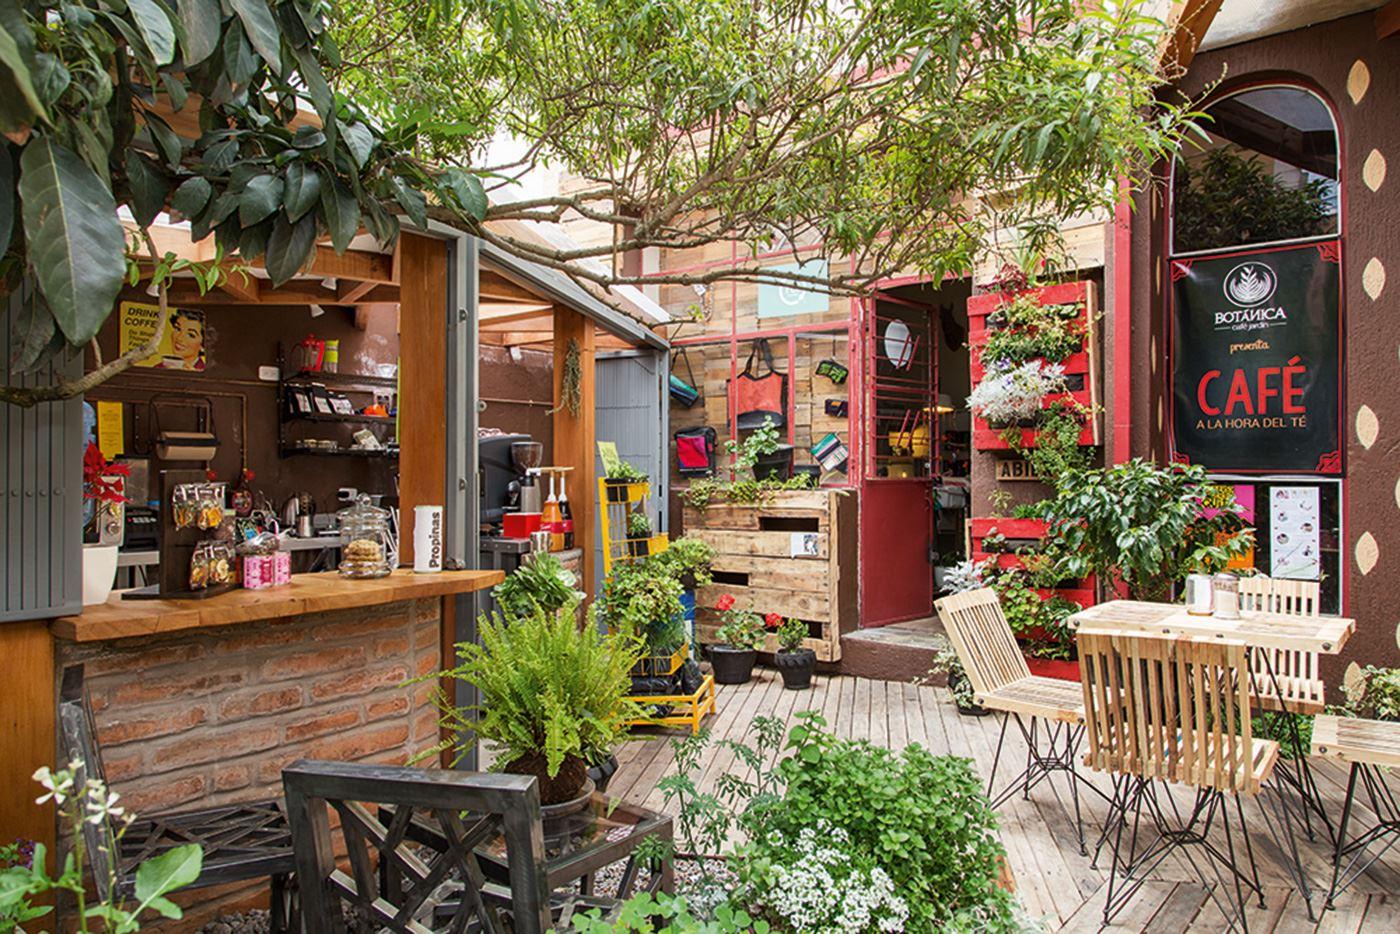 Quito Gastronomic and Urban Art tour